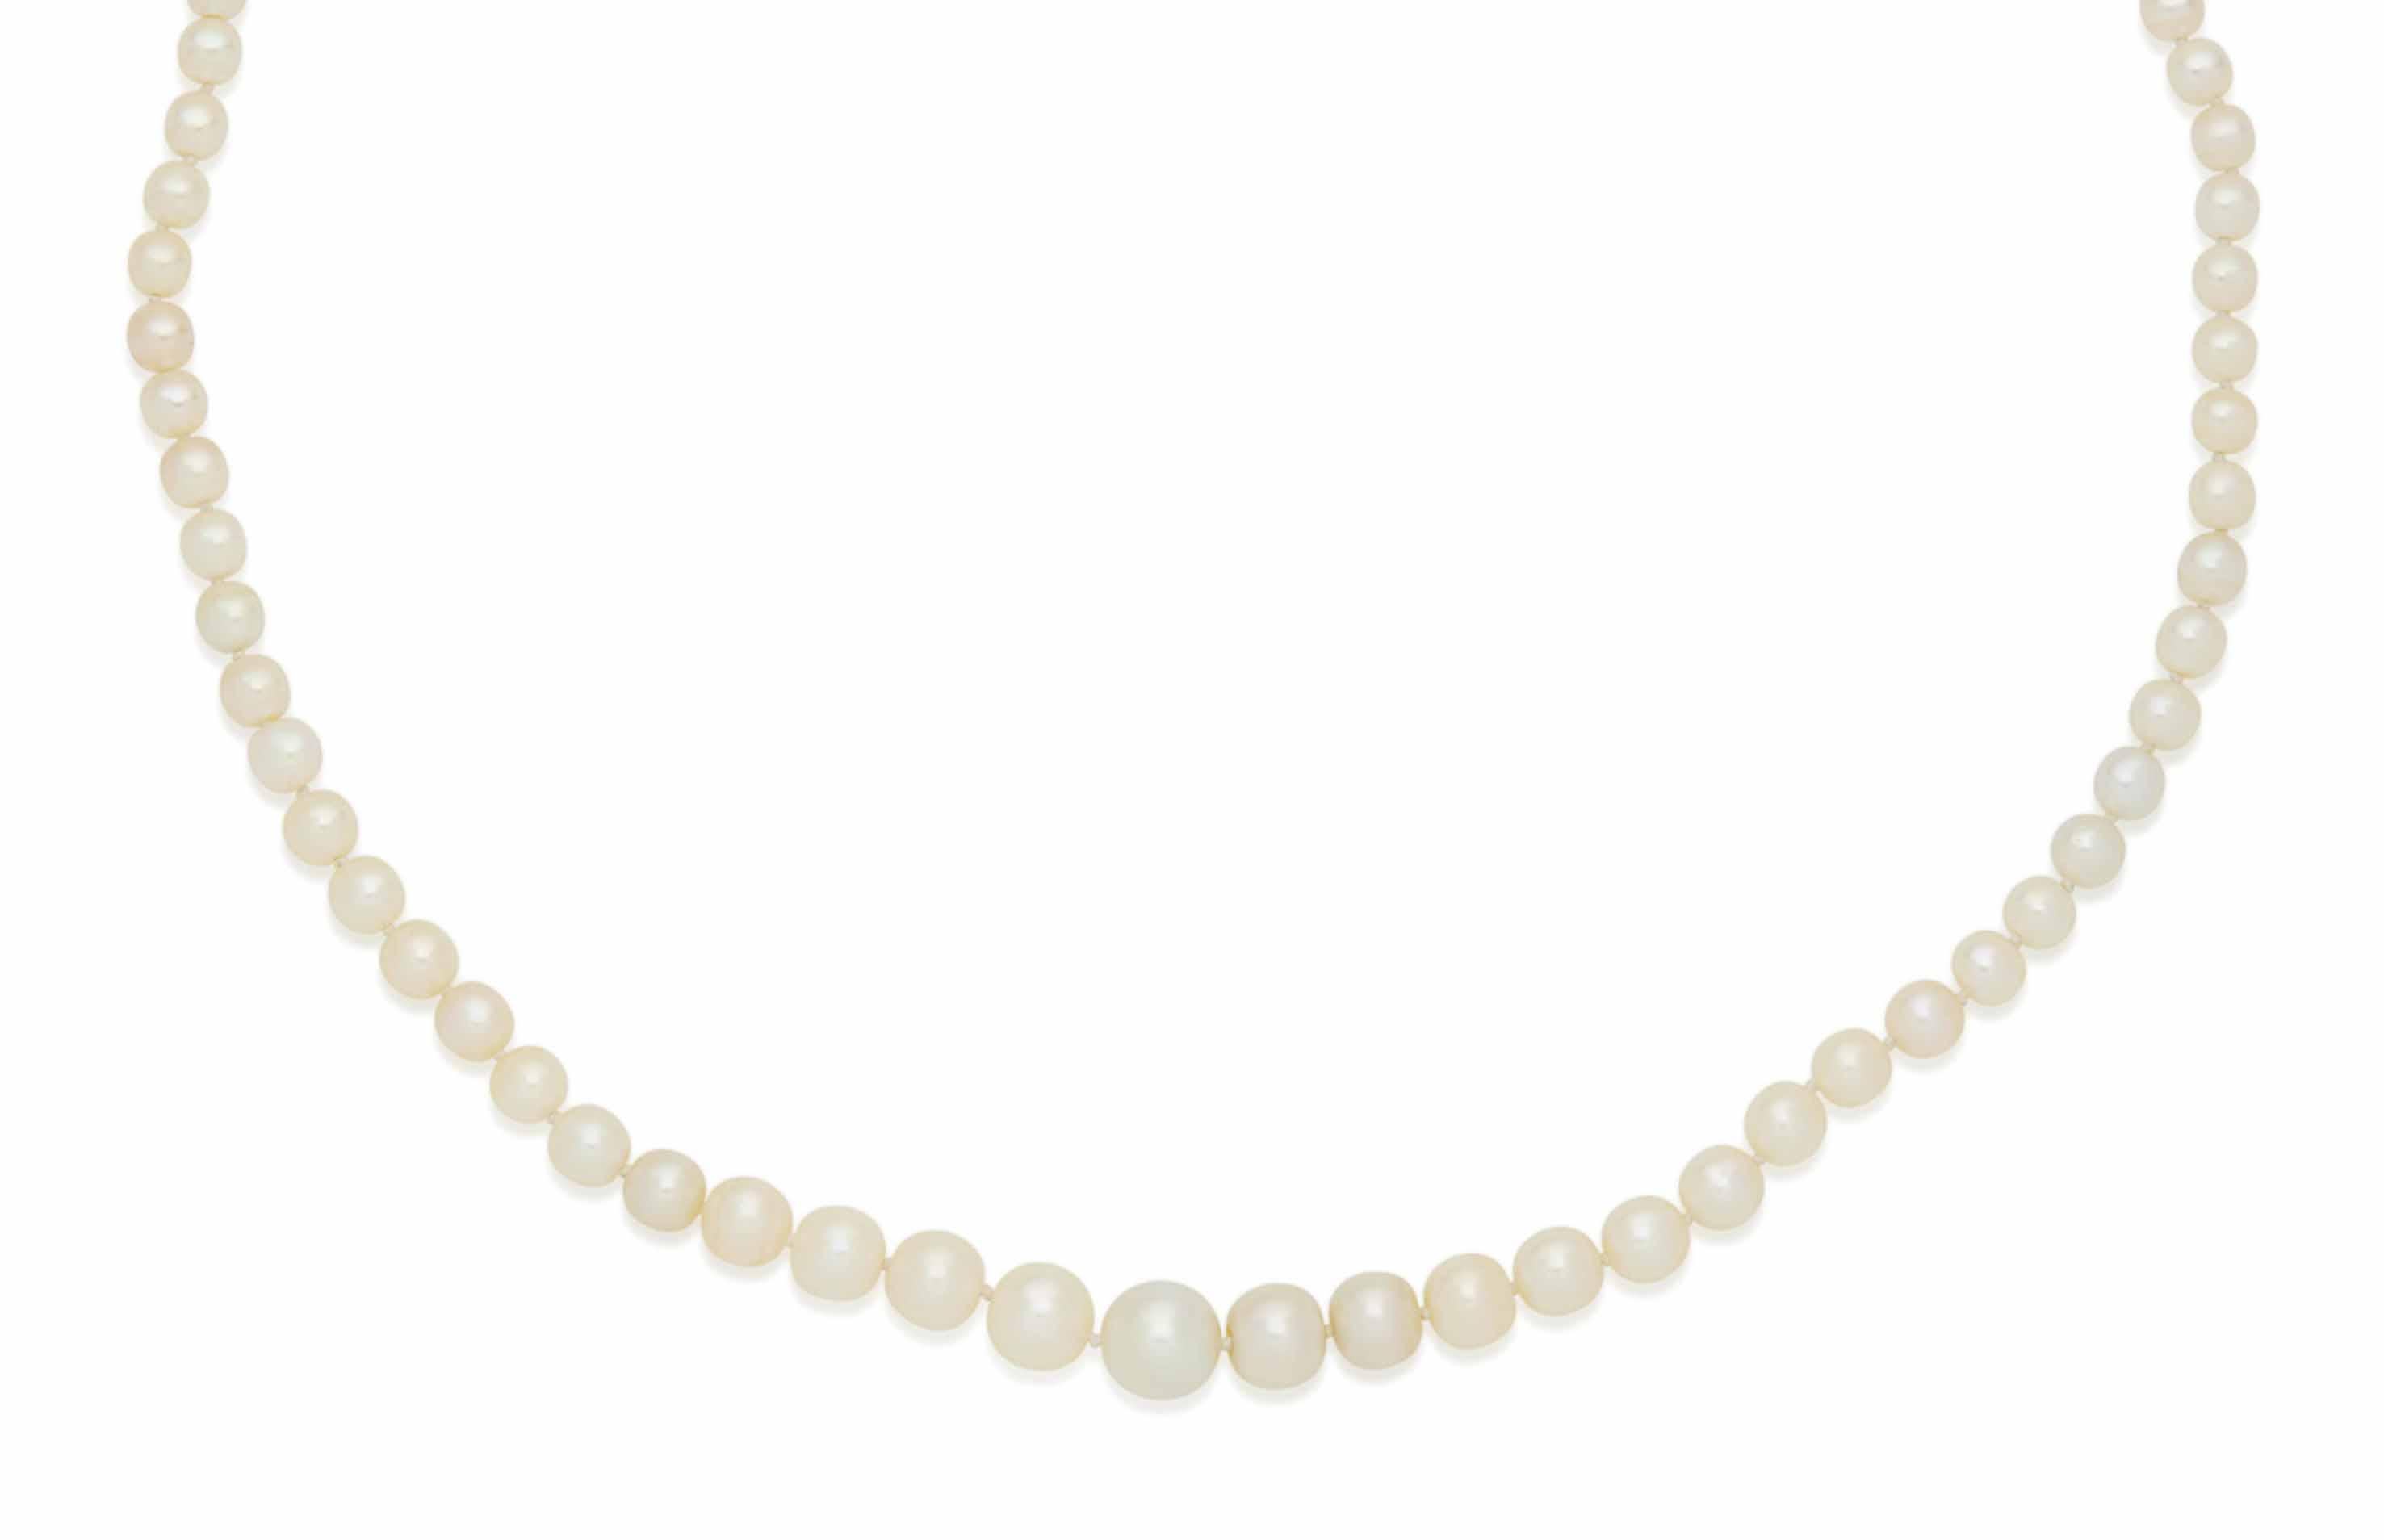 collier perles fines et diamants christie 39 s. Black Bedroom Furniture Sets. Home Design Ideas